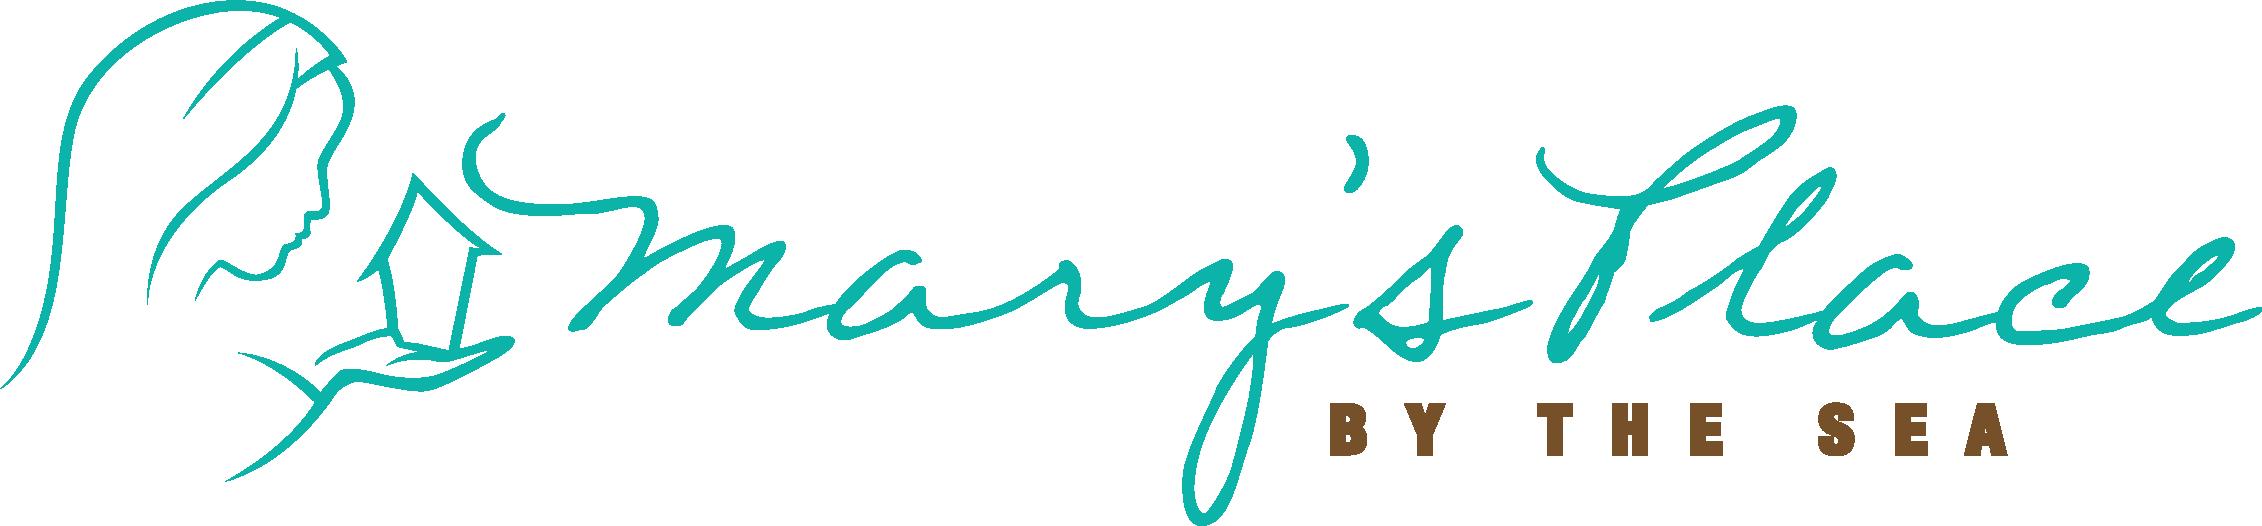 mpbts-logo-standard-2019 (4).png